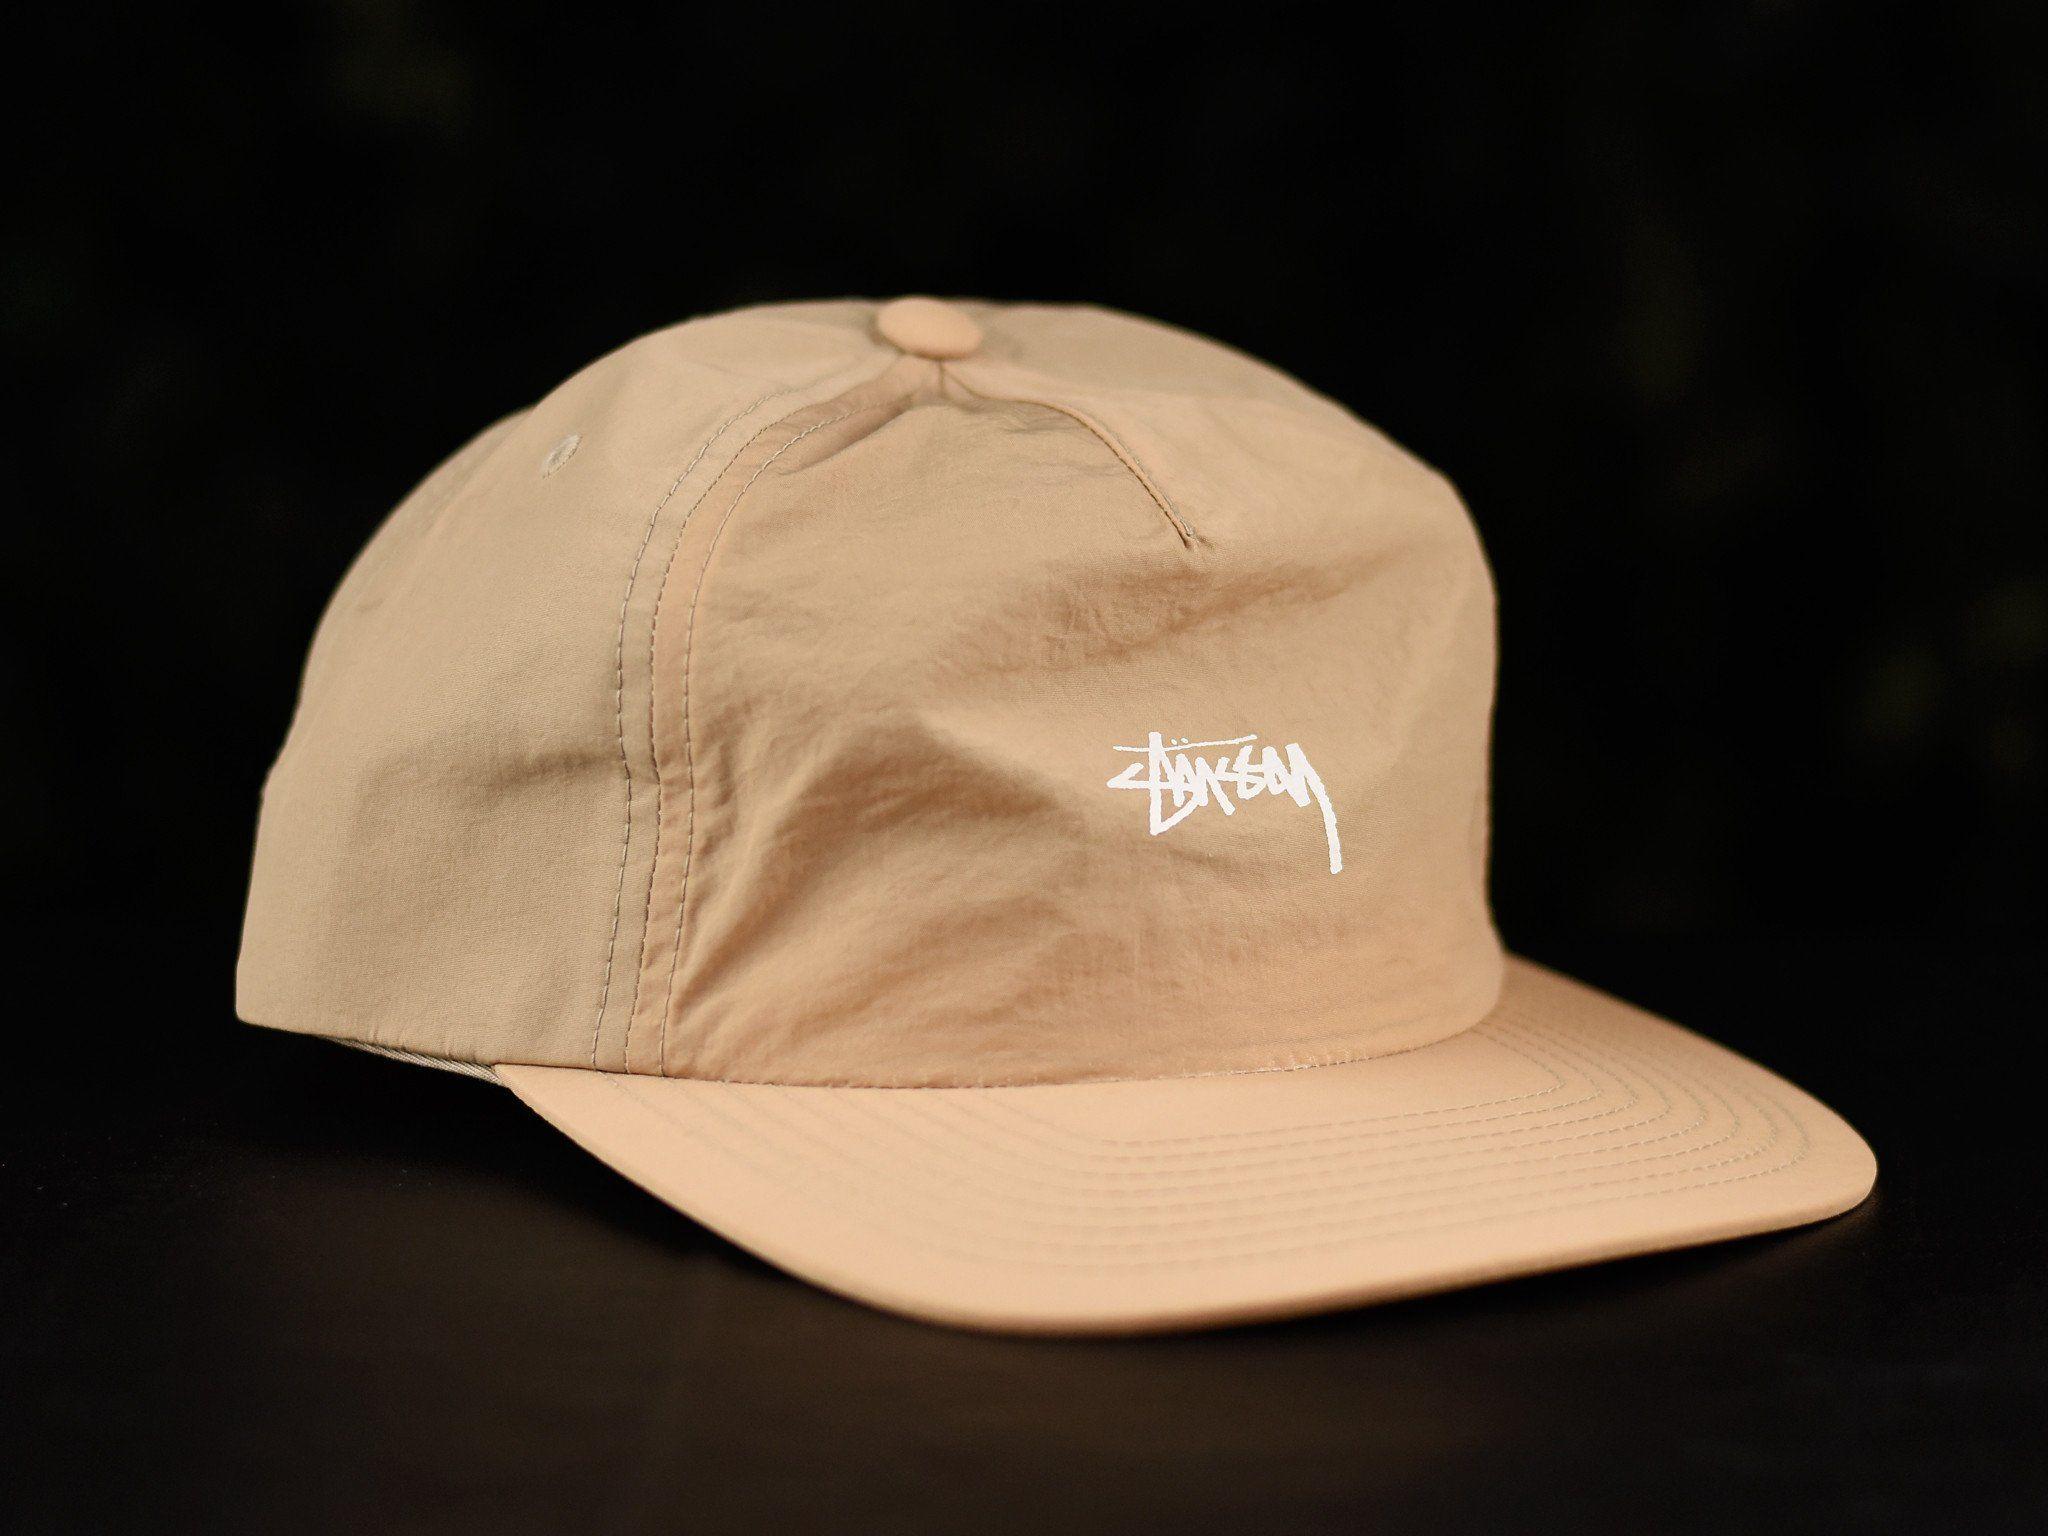 879f1ffb Stussy Euclid Cap Khaki [232155-K] | Stussy | Stussy, Baseball hats ...